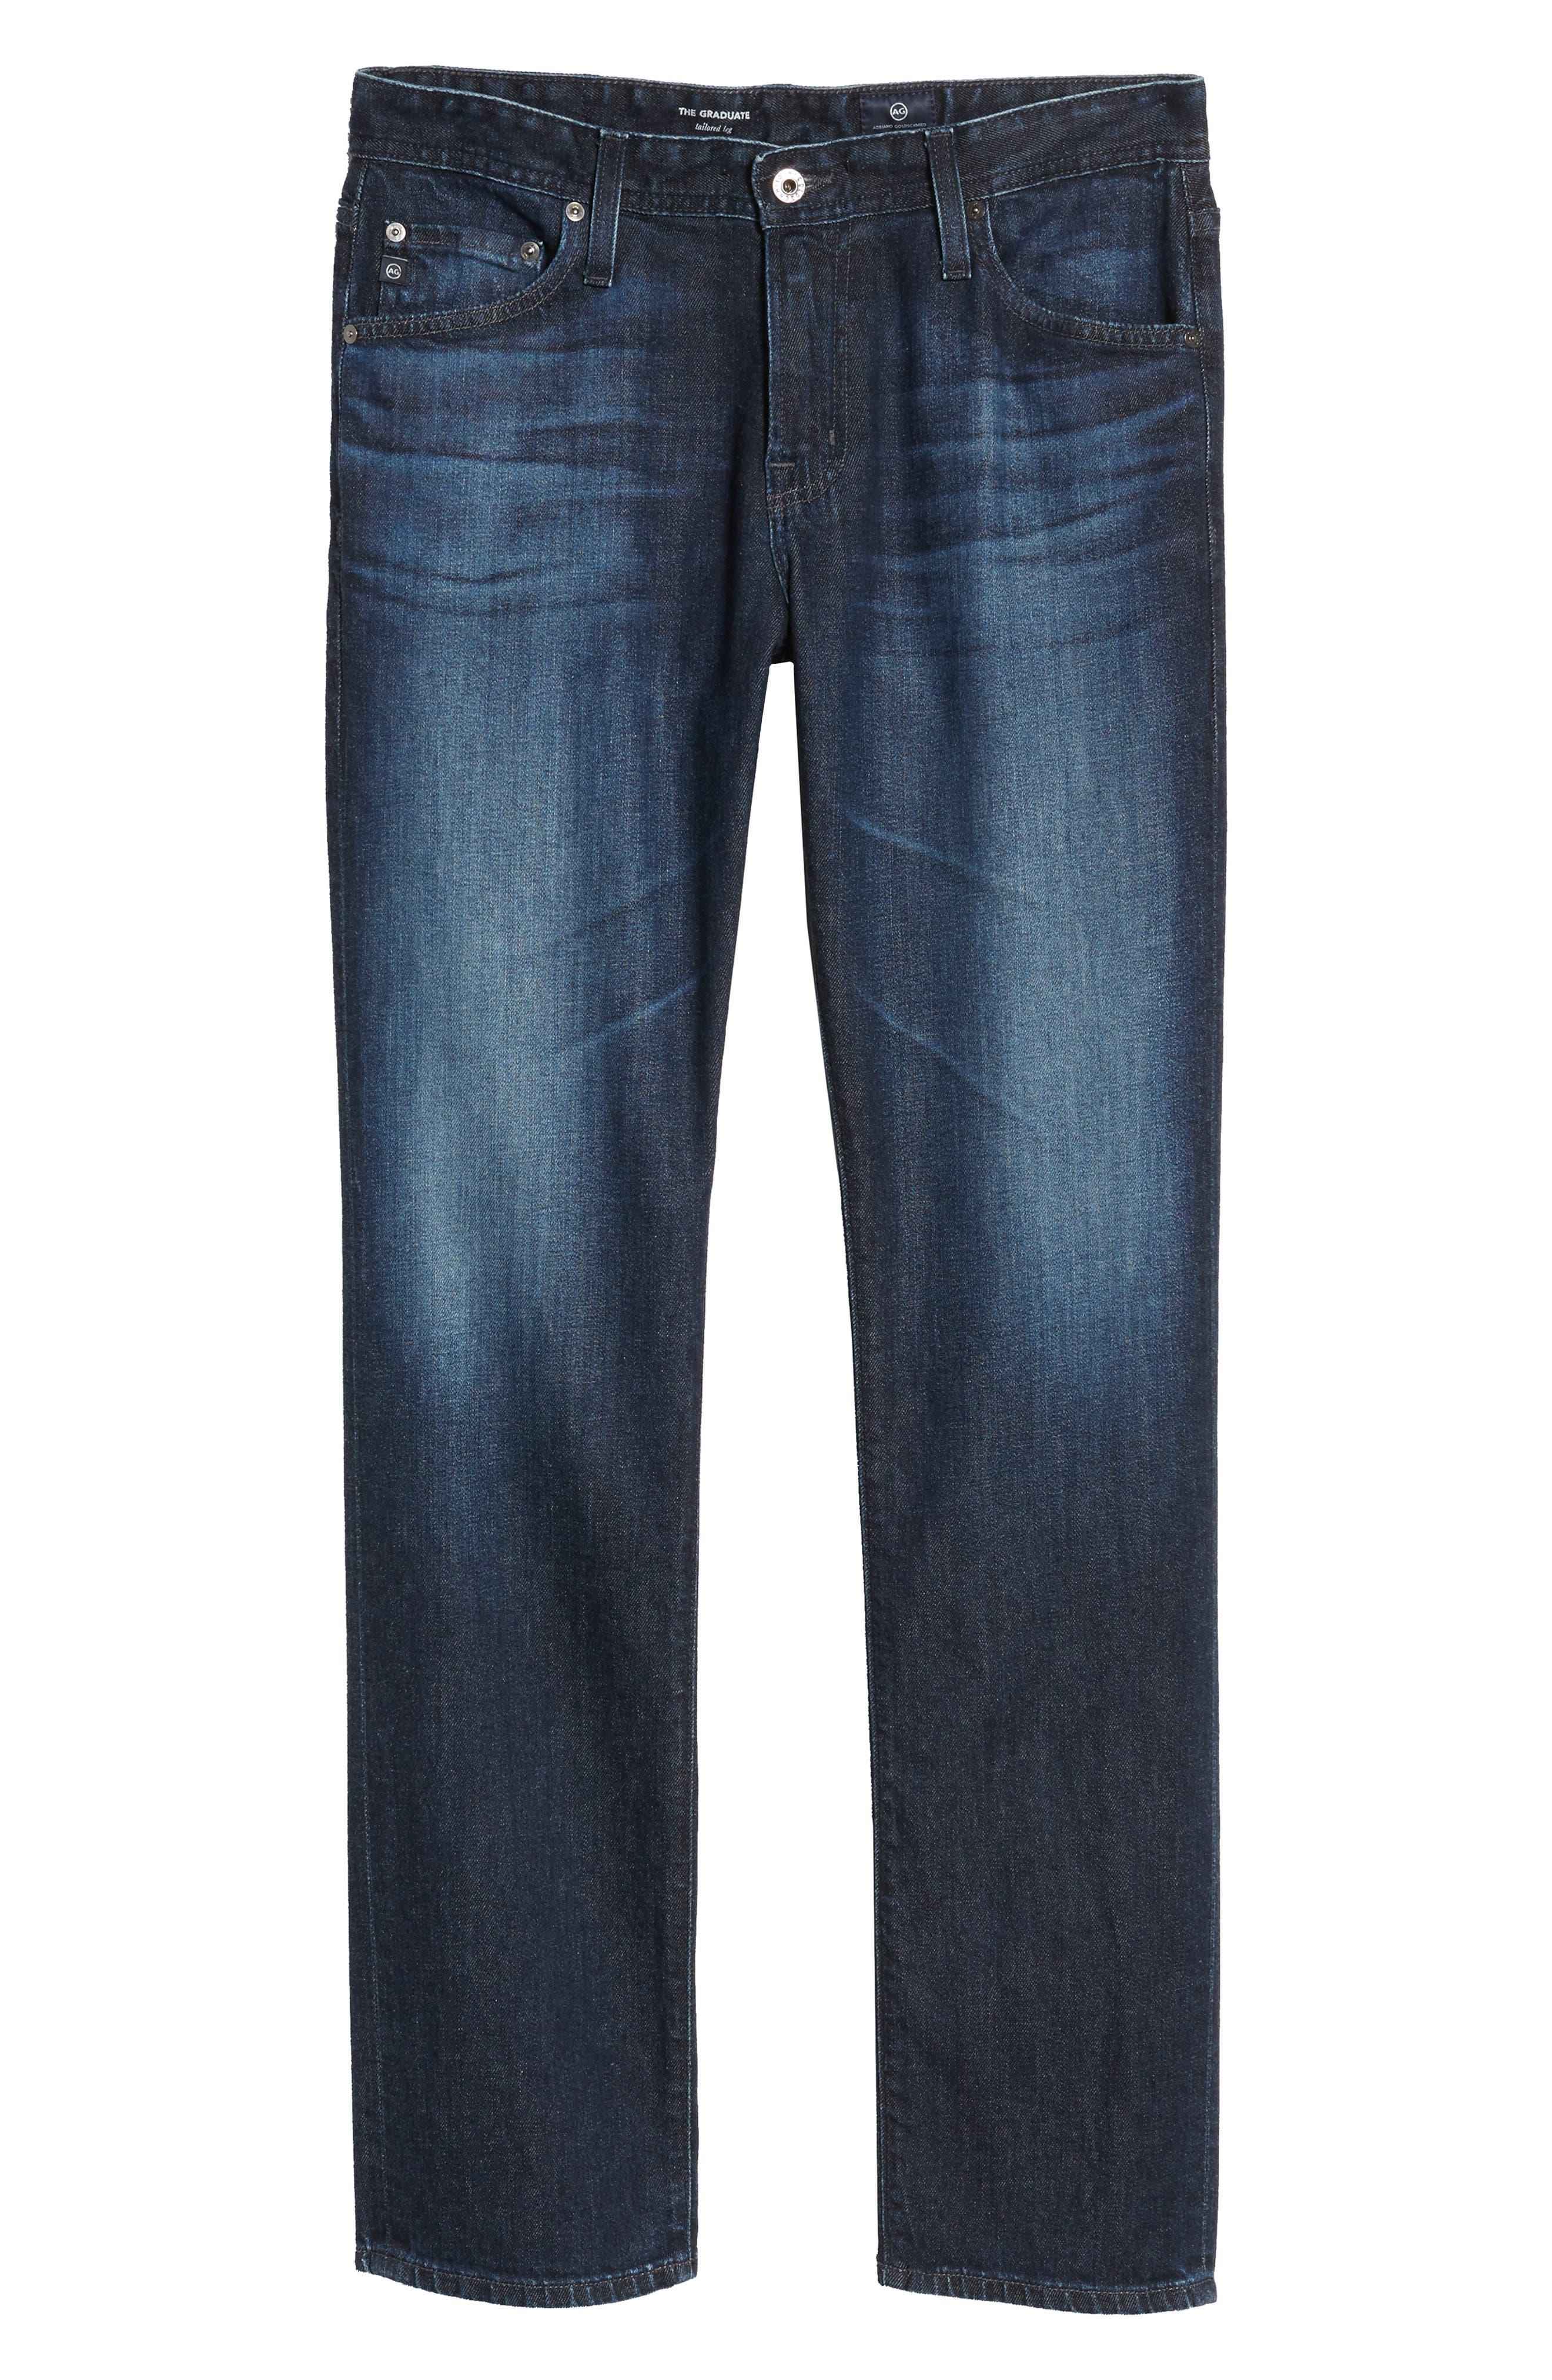 Graduate Slim Straight Leg Jeans,                             Alternate thumbnail 6, color,                             Stafford